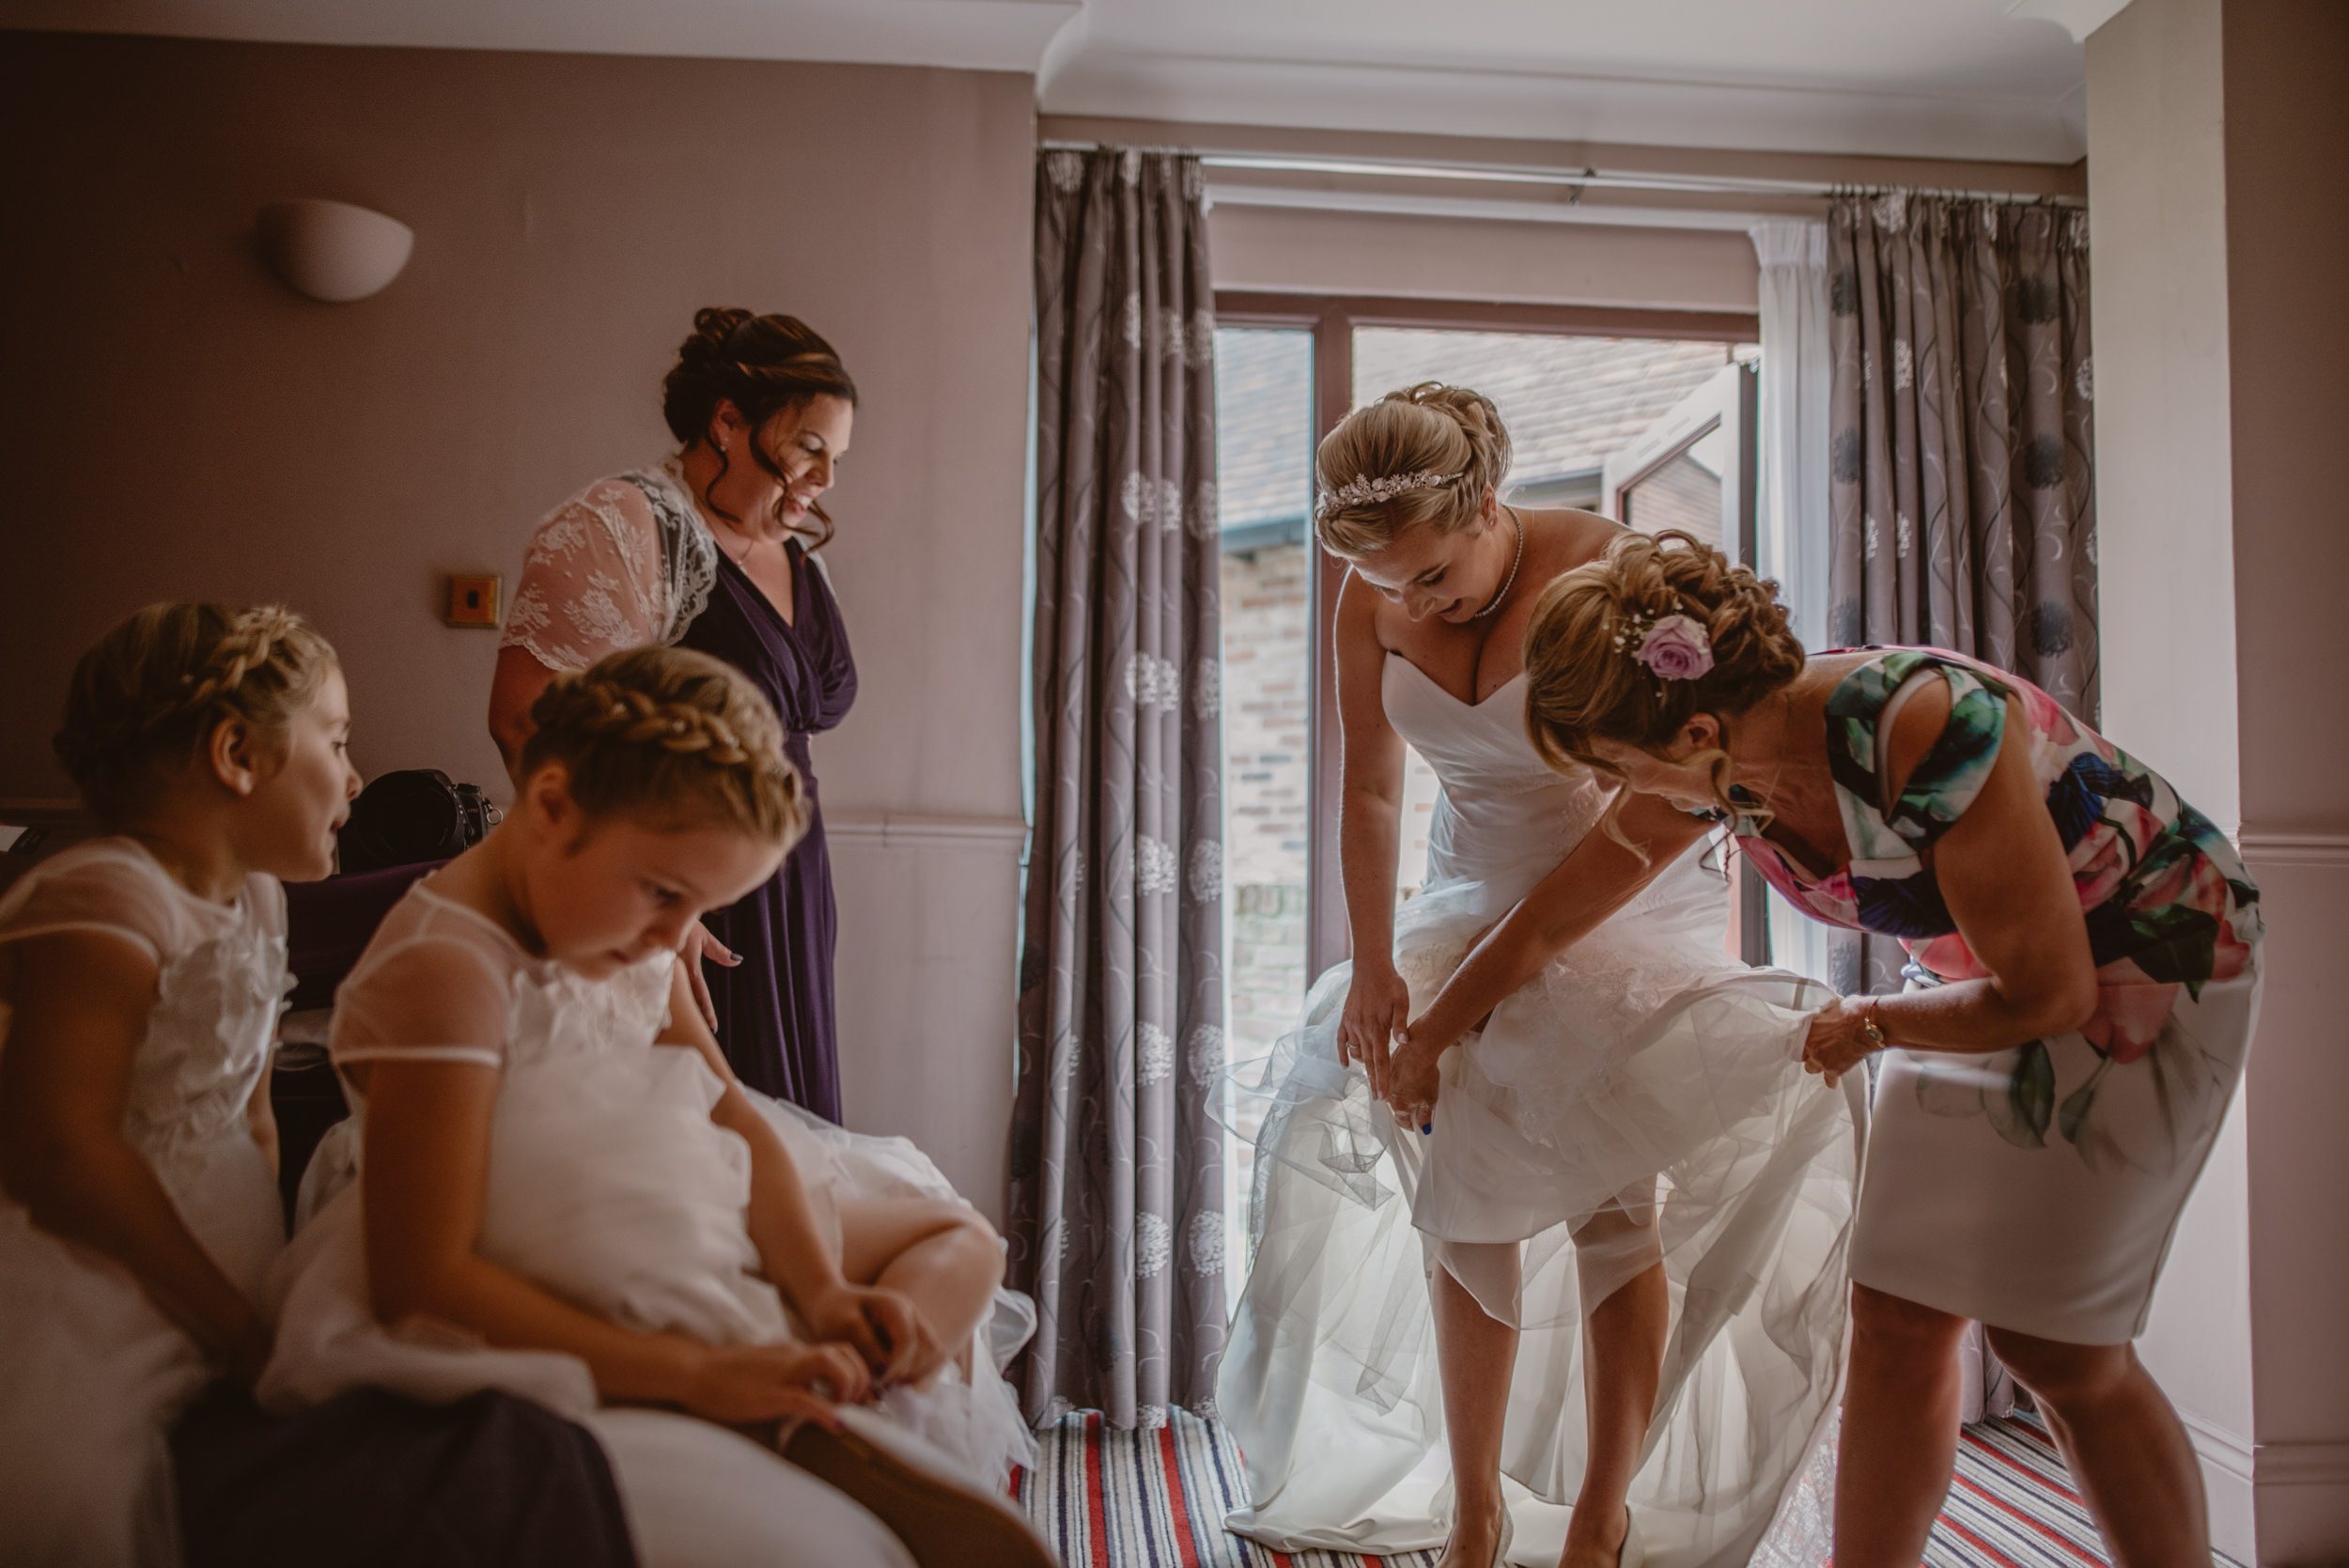 Chantelle-and-Stephen-Old-Thorns-Hotel-Wedding-Liphook-Manu-Mendoza-Wedding-Photography-127.jpg